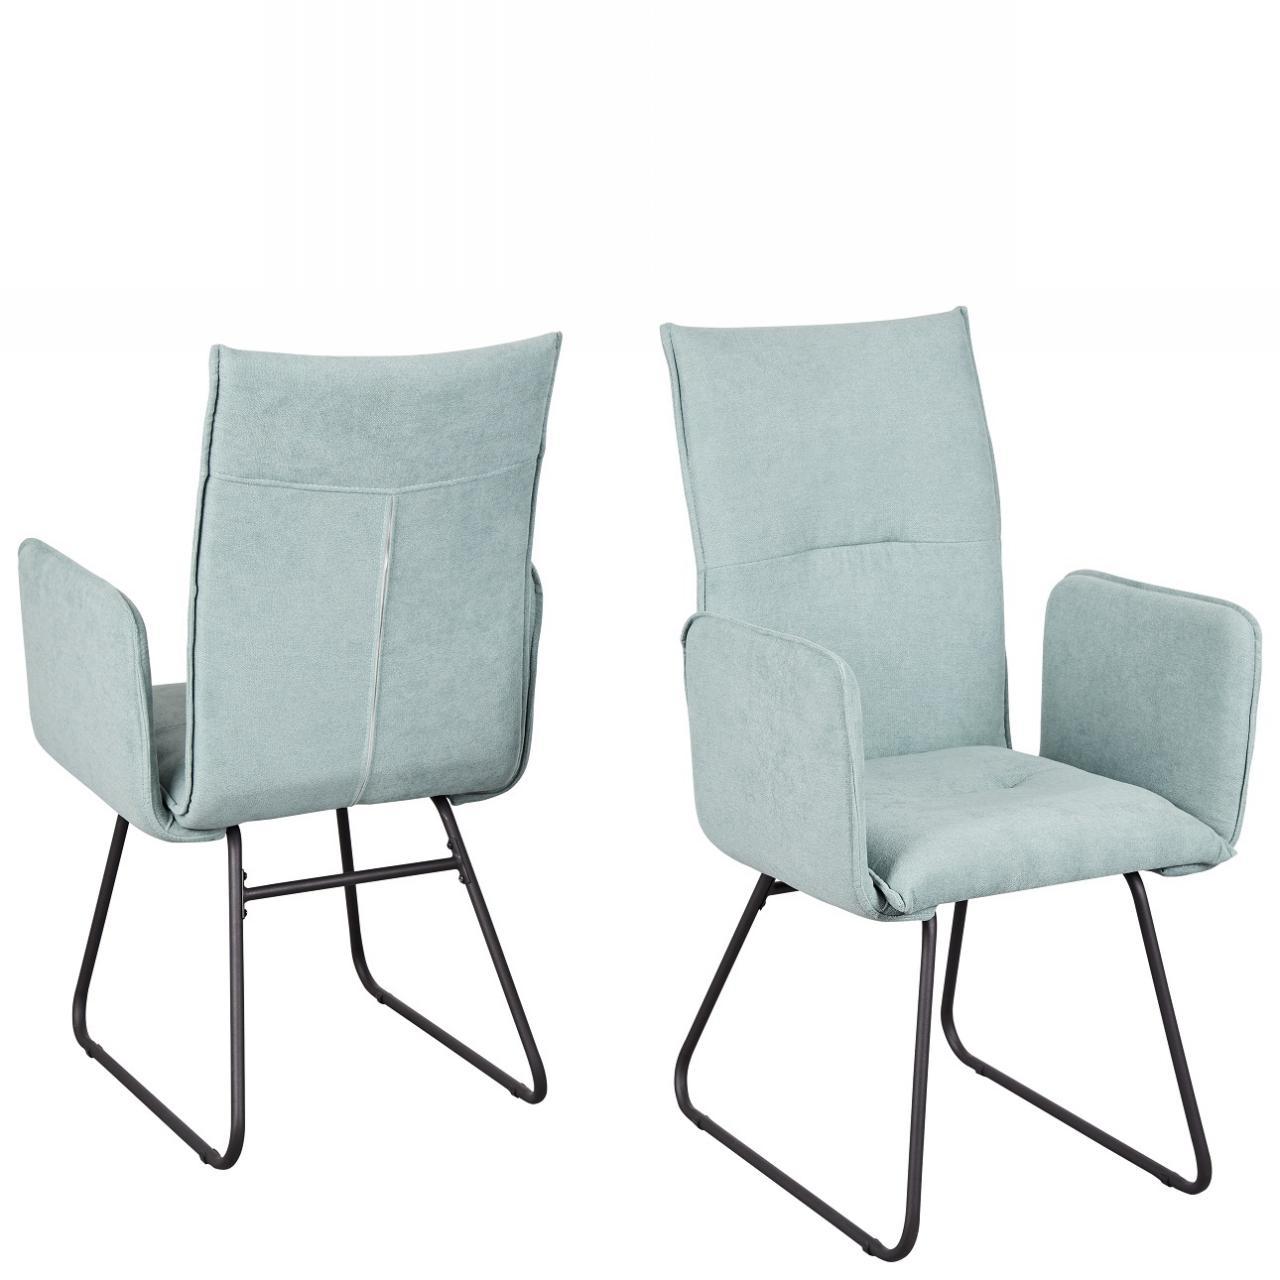 Stuhl Arona 5015-12 Esszimmerstuhl Armlehnstuhl Stoff Metall Küchenstuhl Mint